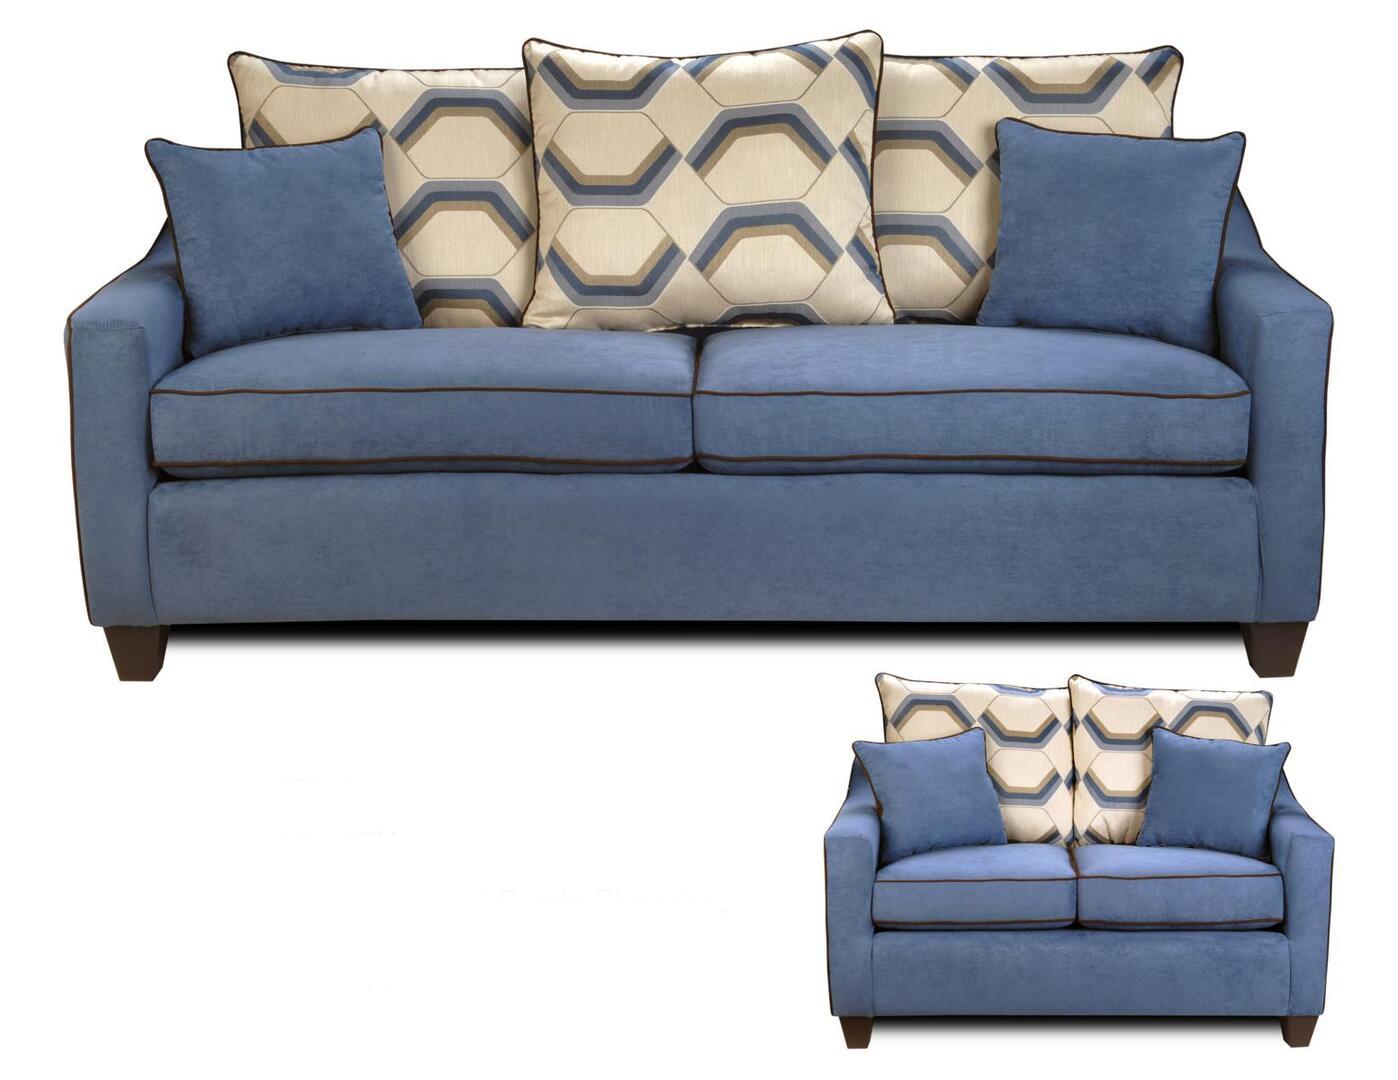 Chelsea Home Furniture 299700sl Georgia Living Room Sets Appliances Connection